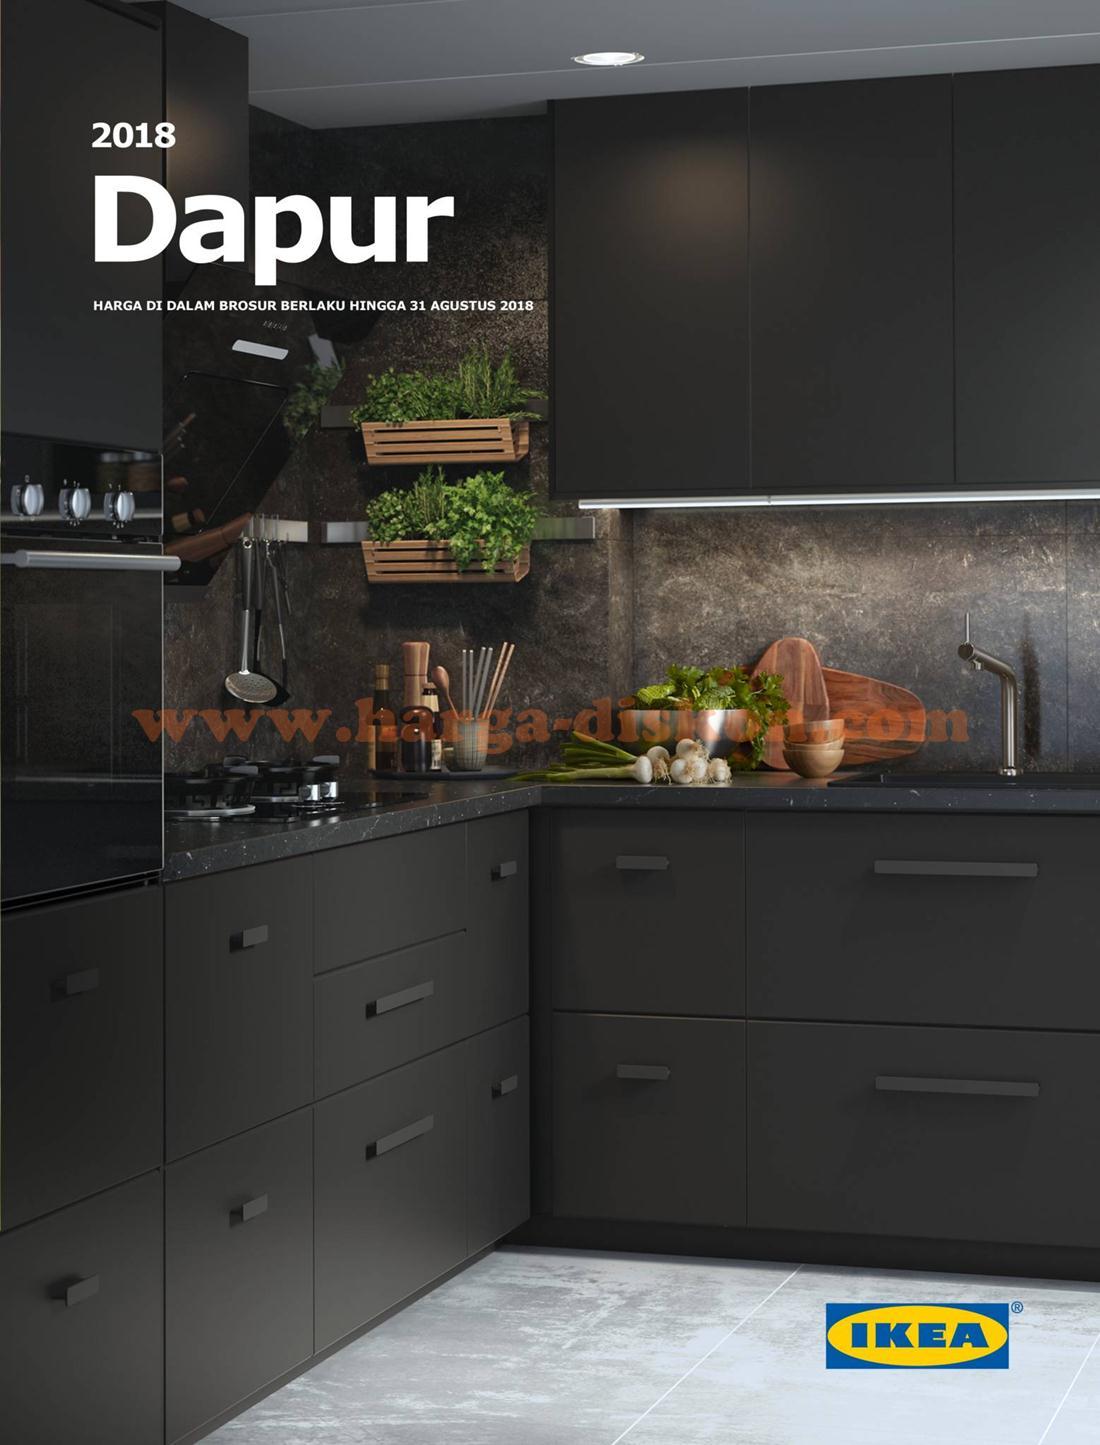 Katalog Ikea Brosur Ikea 2018 Dapur Harga Promo